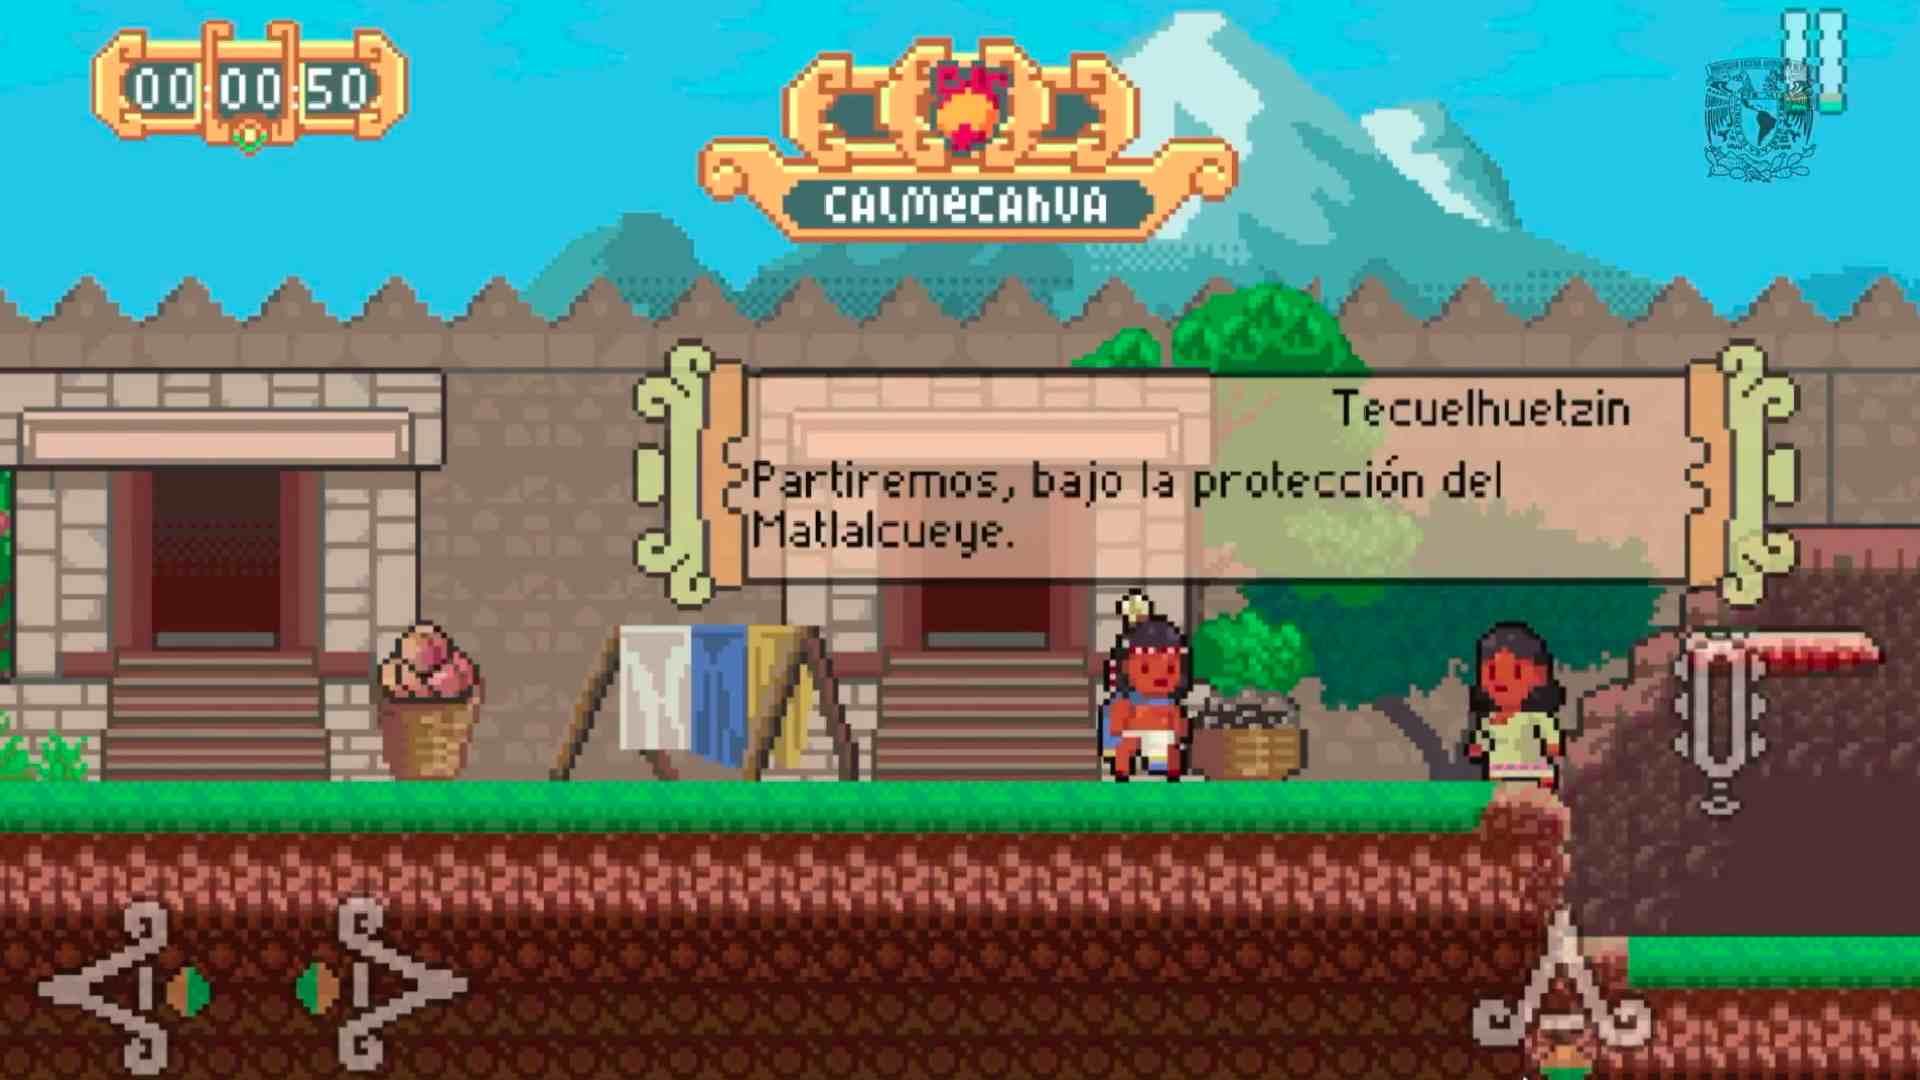 Yoapan-Videojuego-Tlaxcala-UNAM-UATx